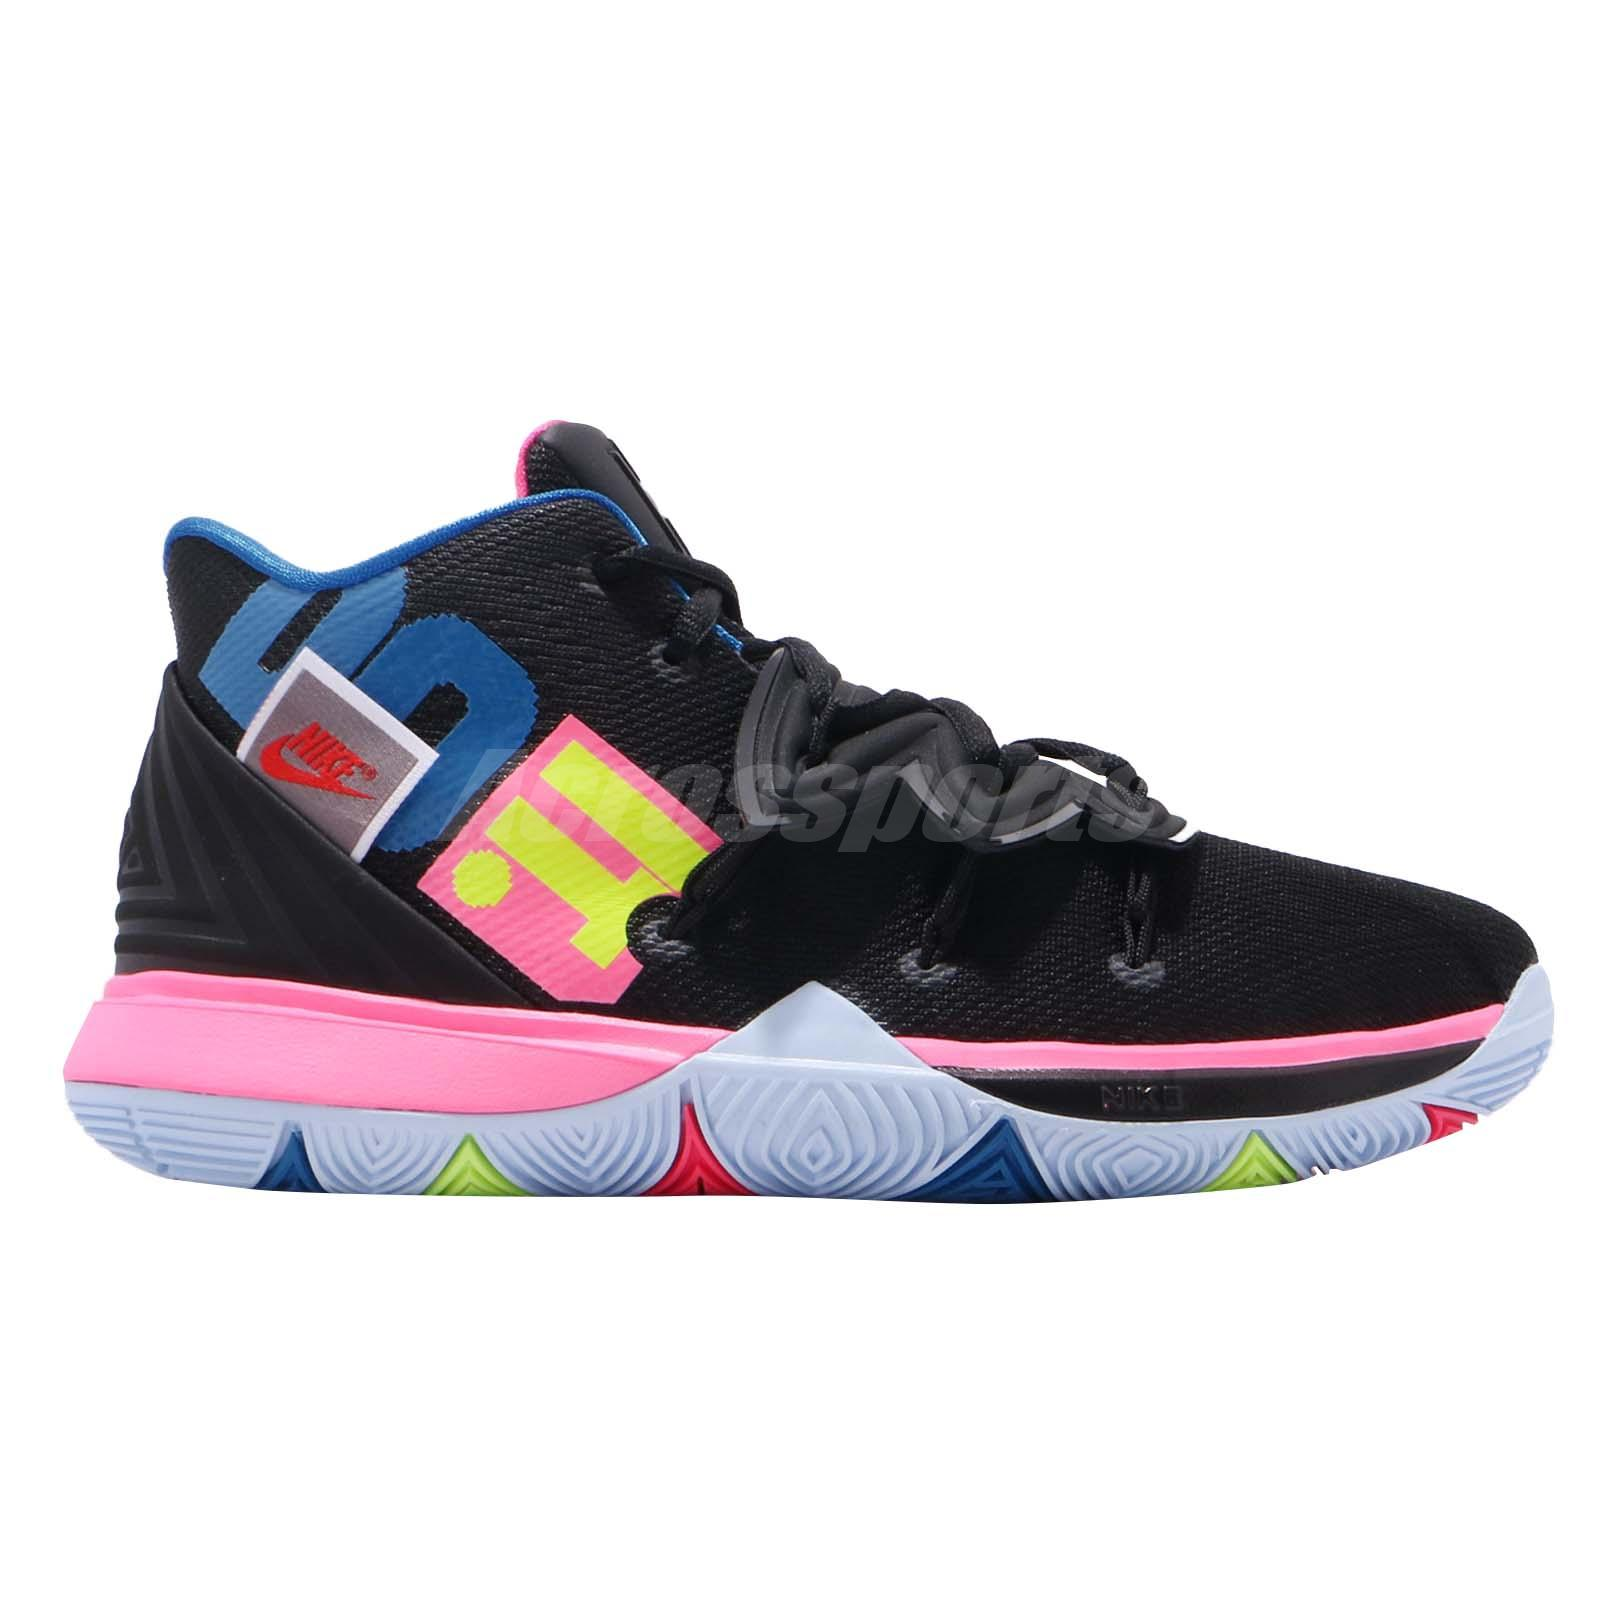 online store 48fef f1d5b Nike Kyrie 5 GS V Irving Just Do It Kid Women Basketball Shoe ...